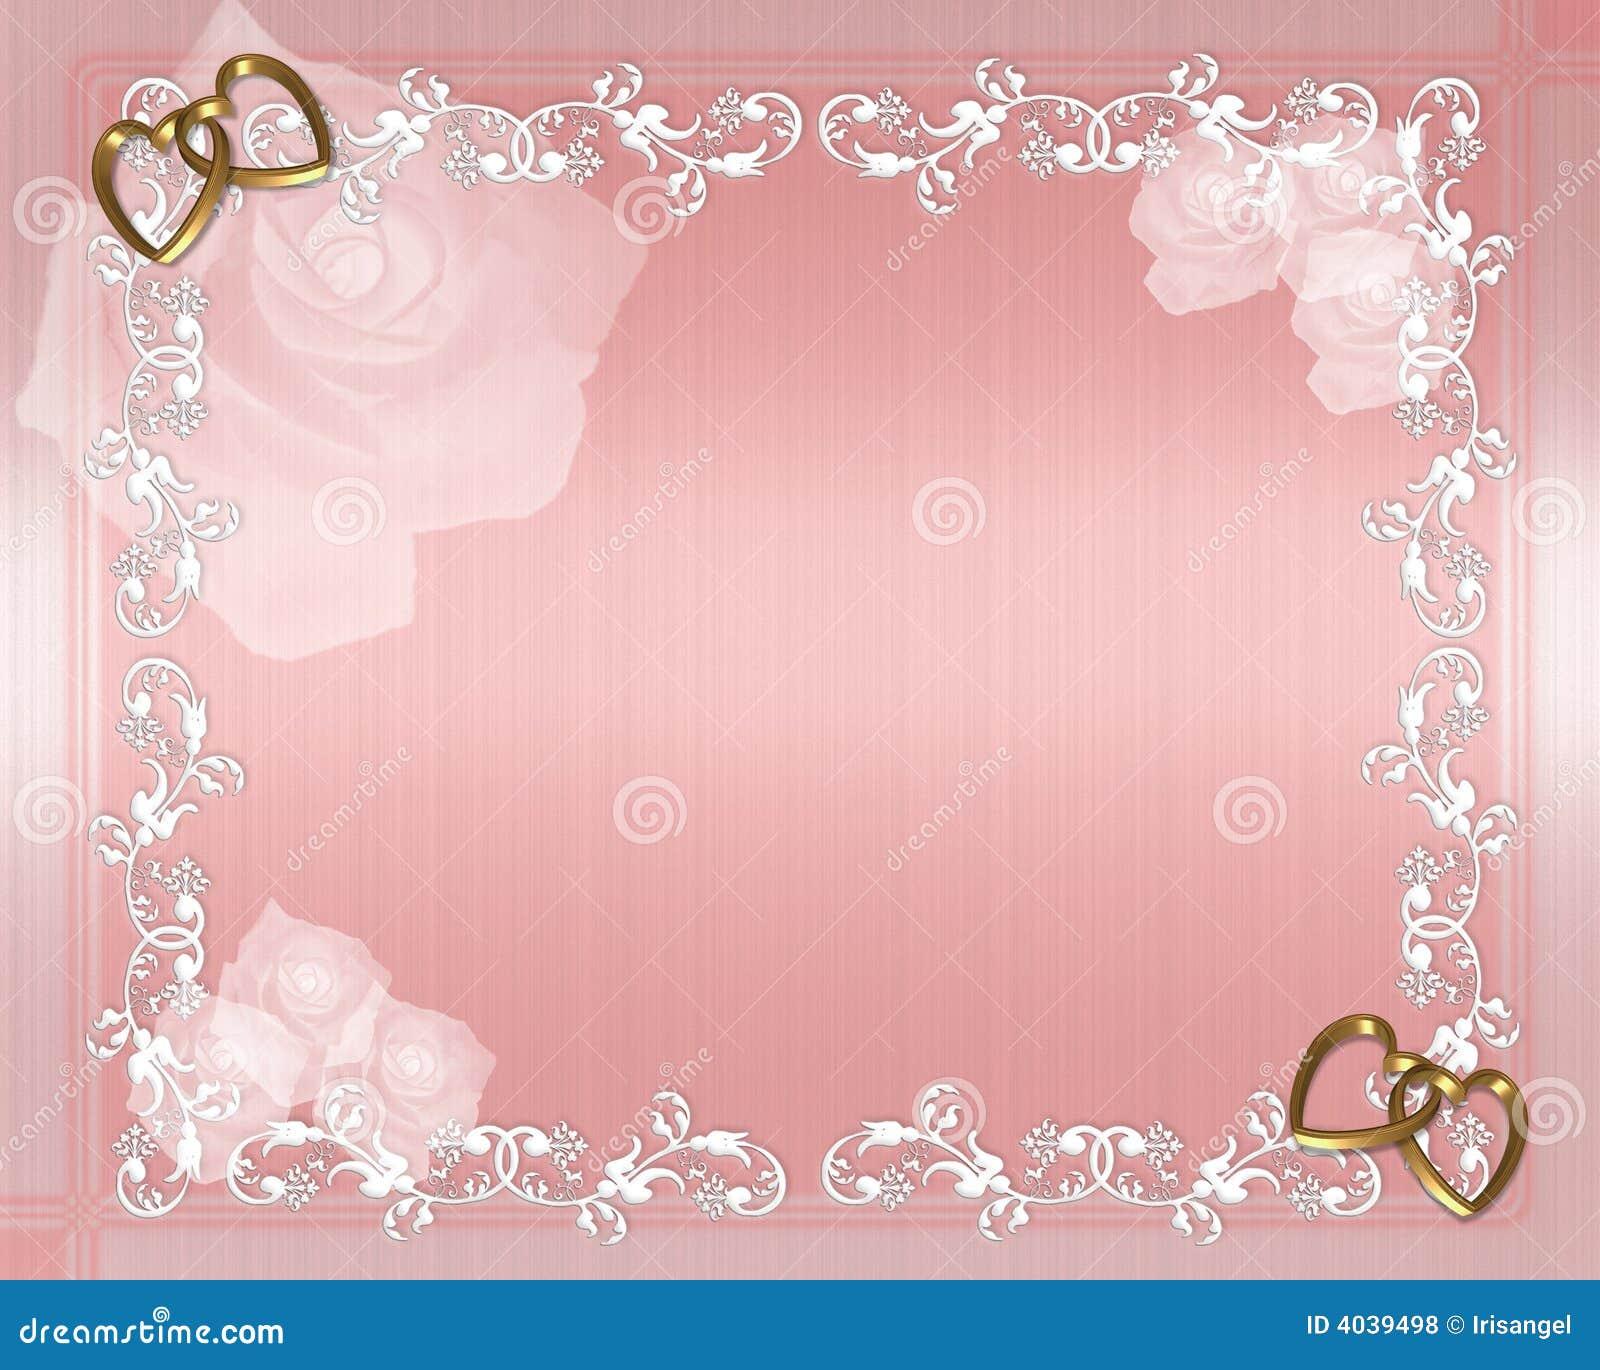 Valentine Wedding Border Royalty Free Stock Photos Image